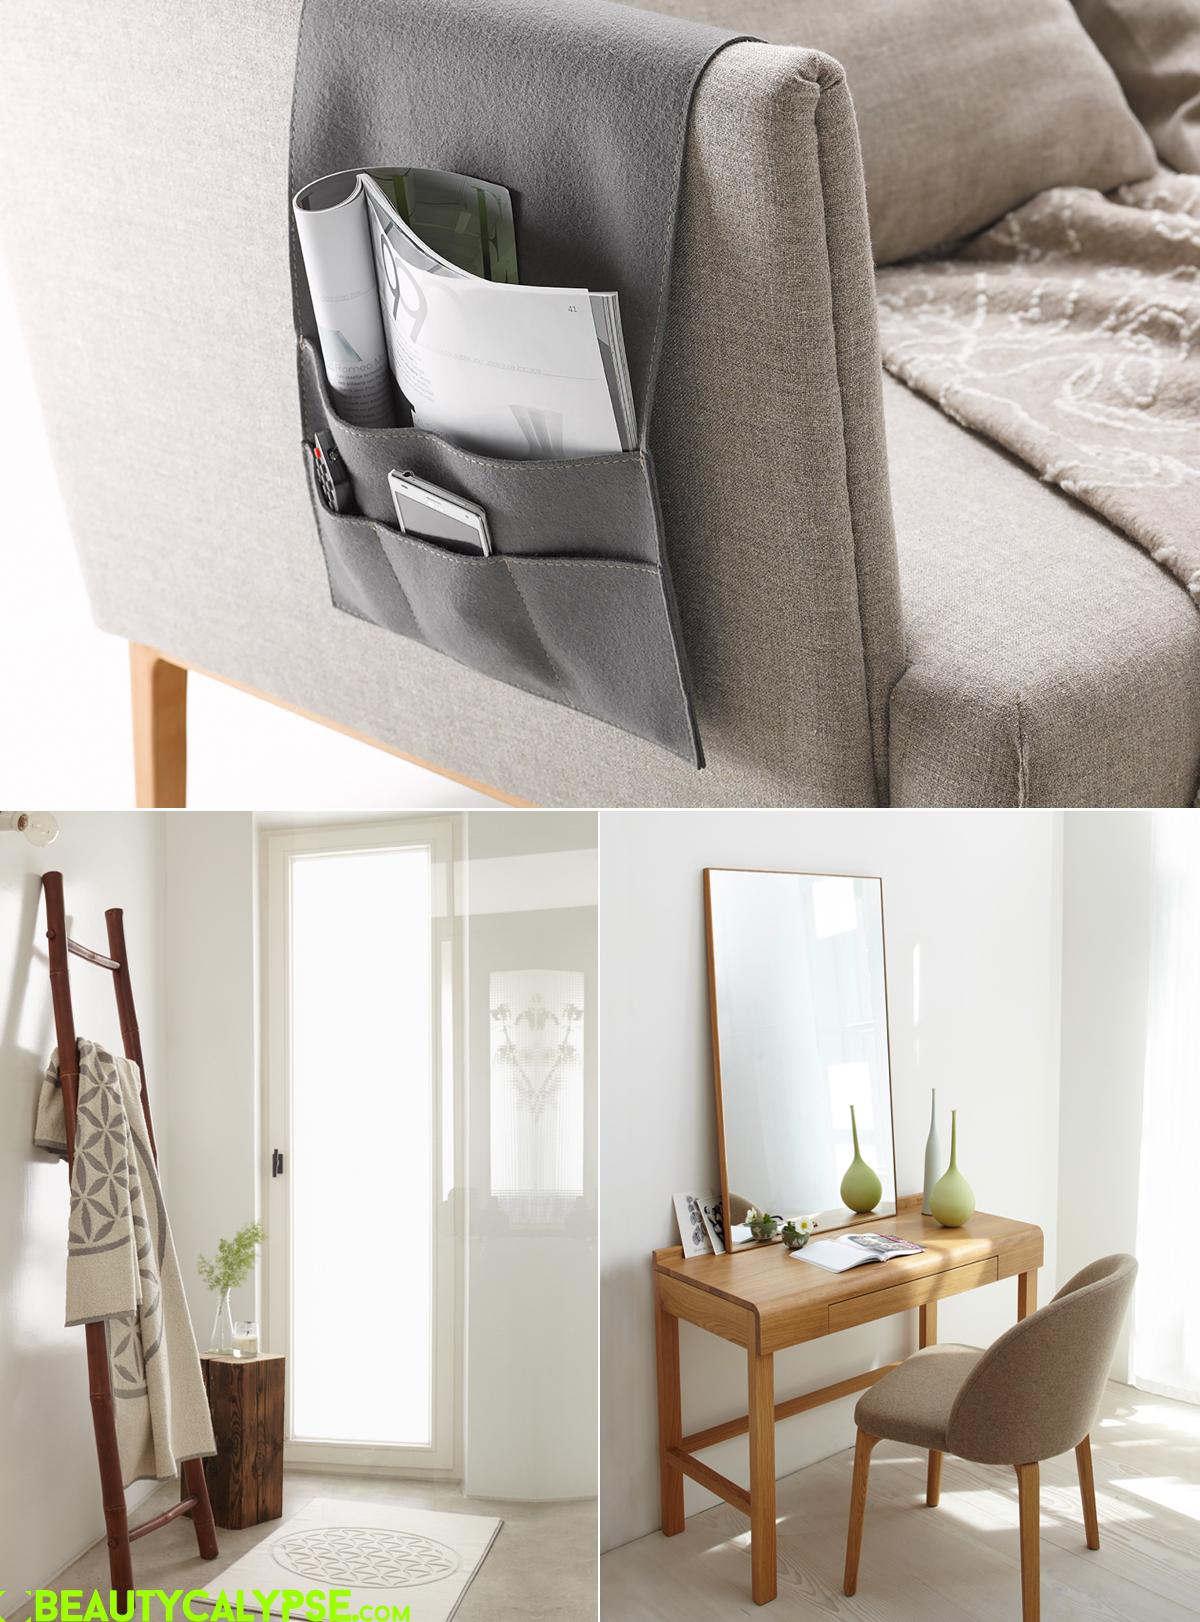 gruene-erde-eco-fair-home-textiles